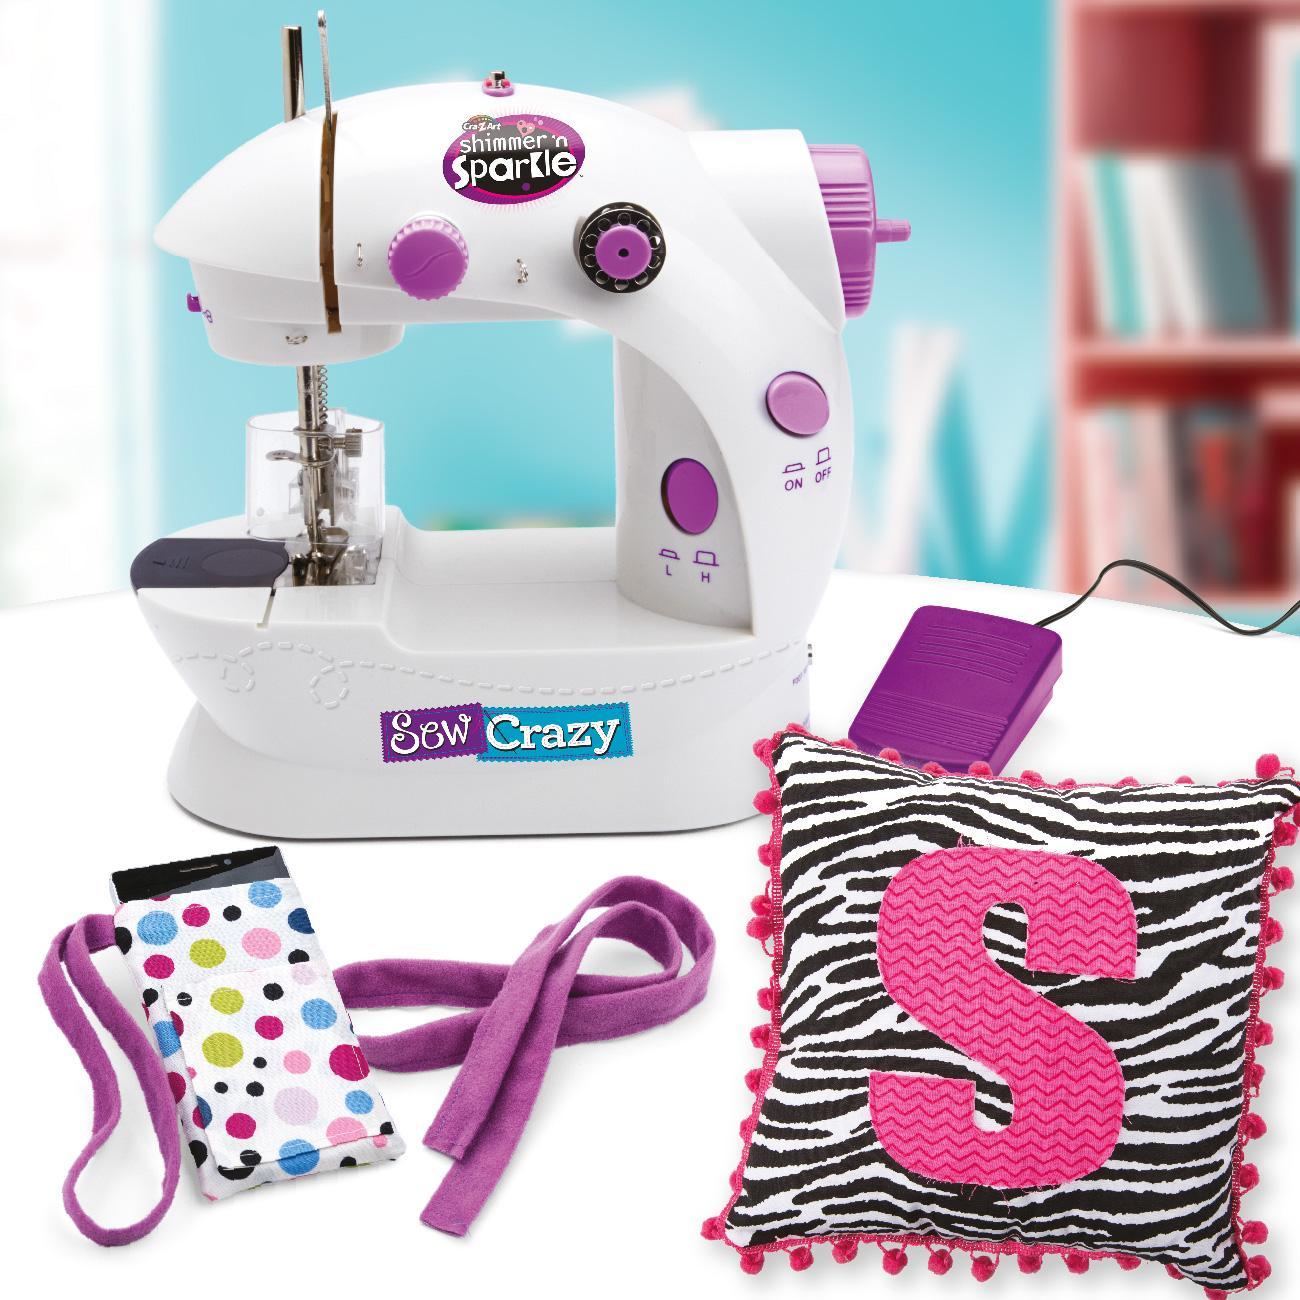 máquina coser juguete, máquina coser eléctrica, juguete a pilas, máquina coser pedal,